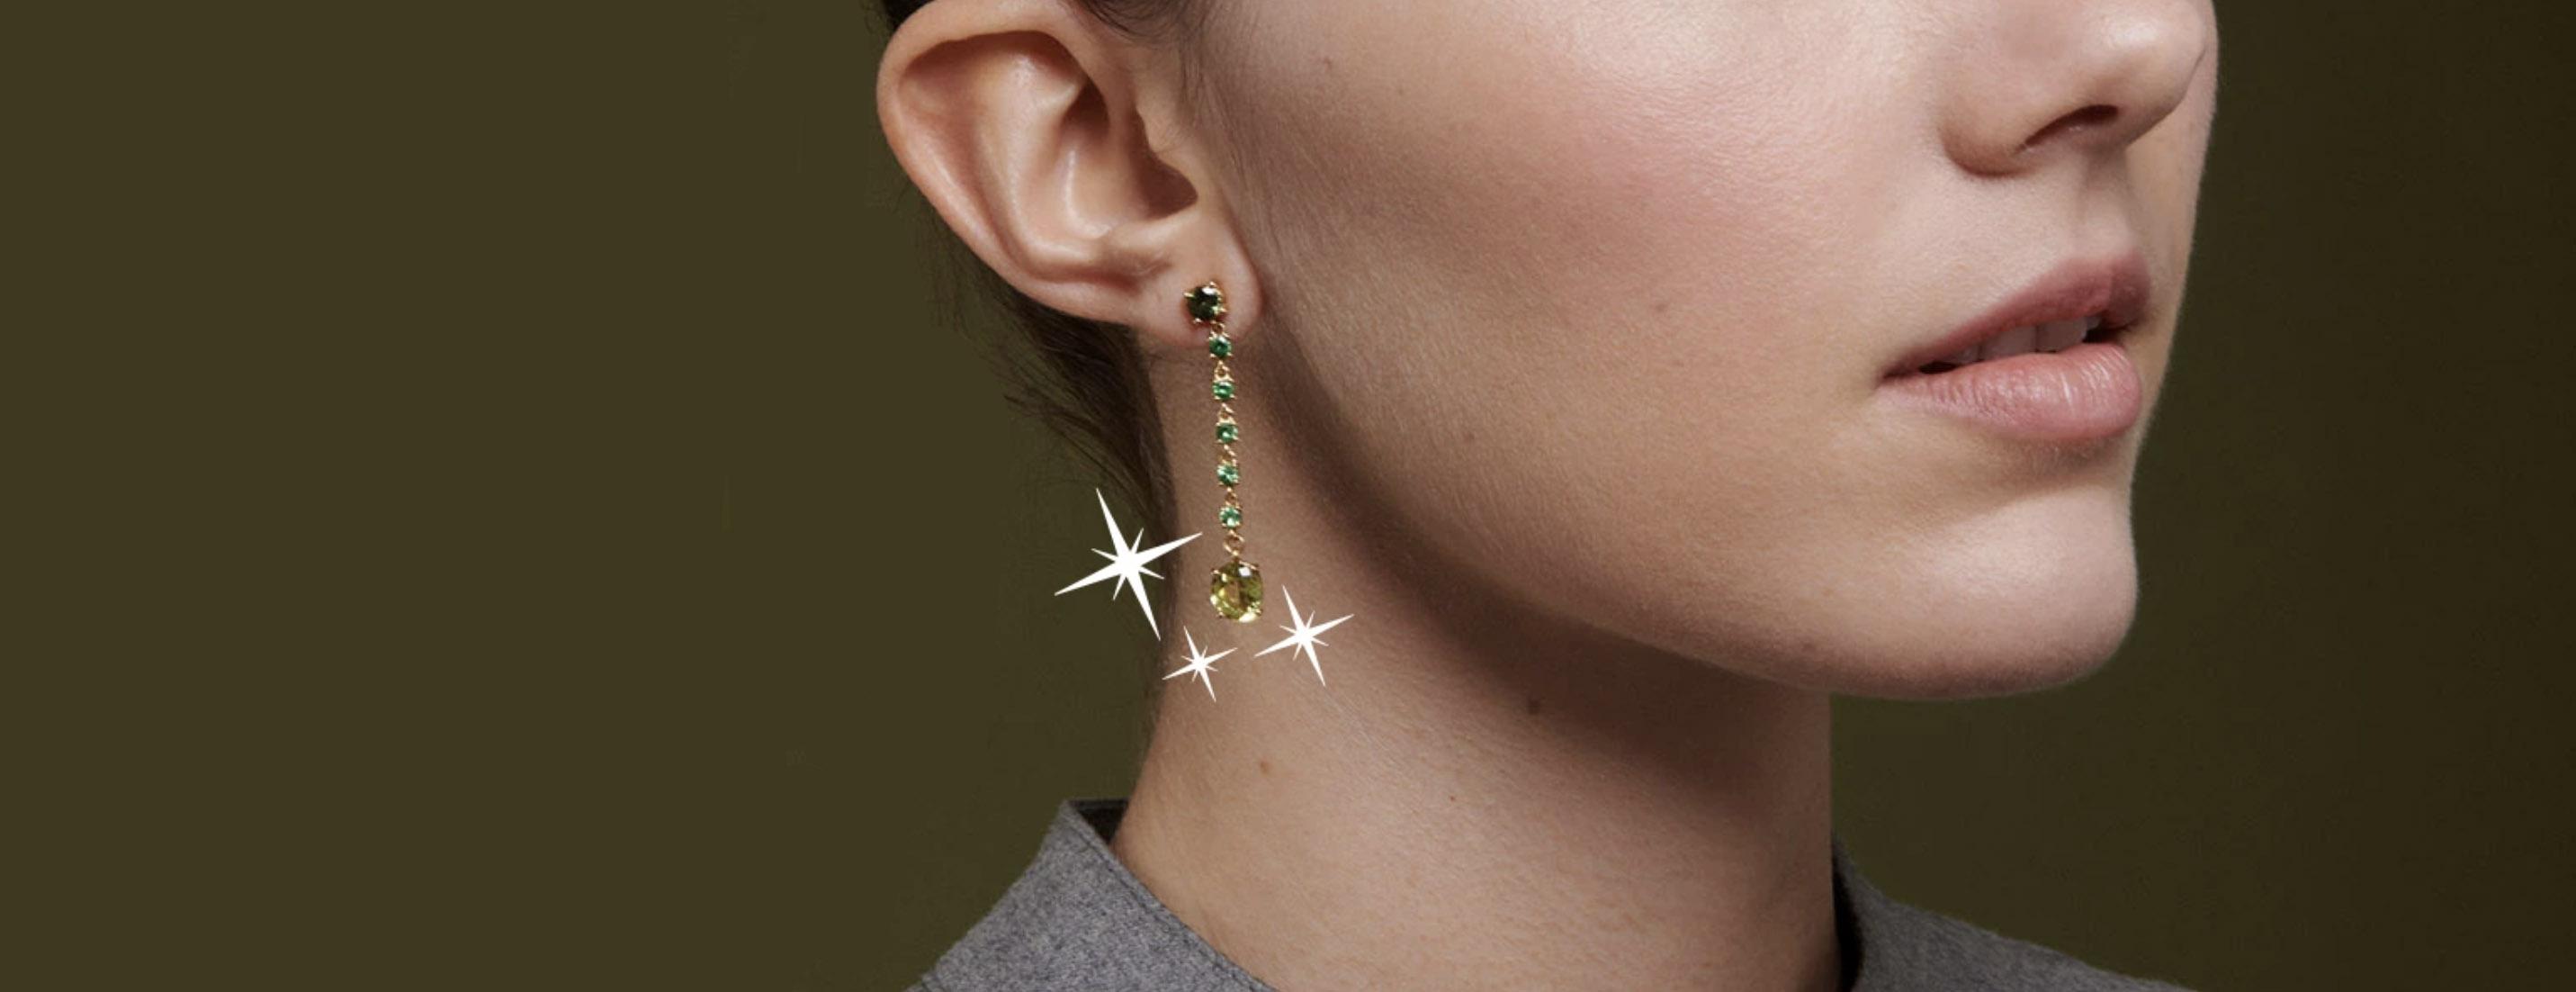 Eva Gems and Jewels earrings